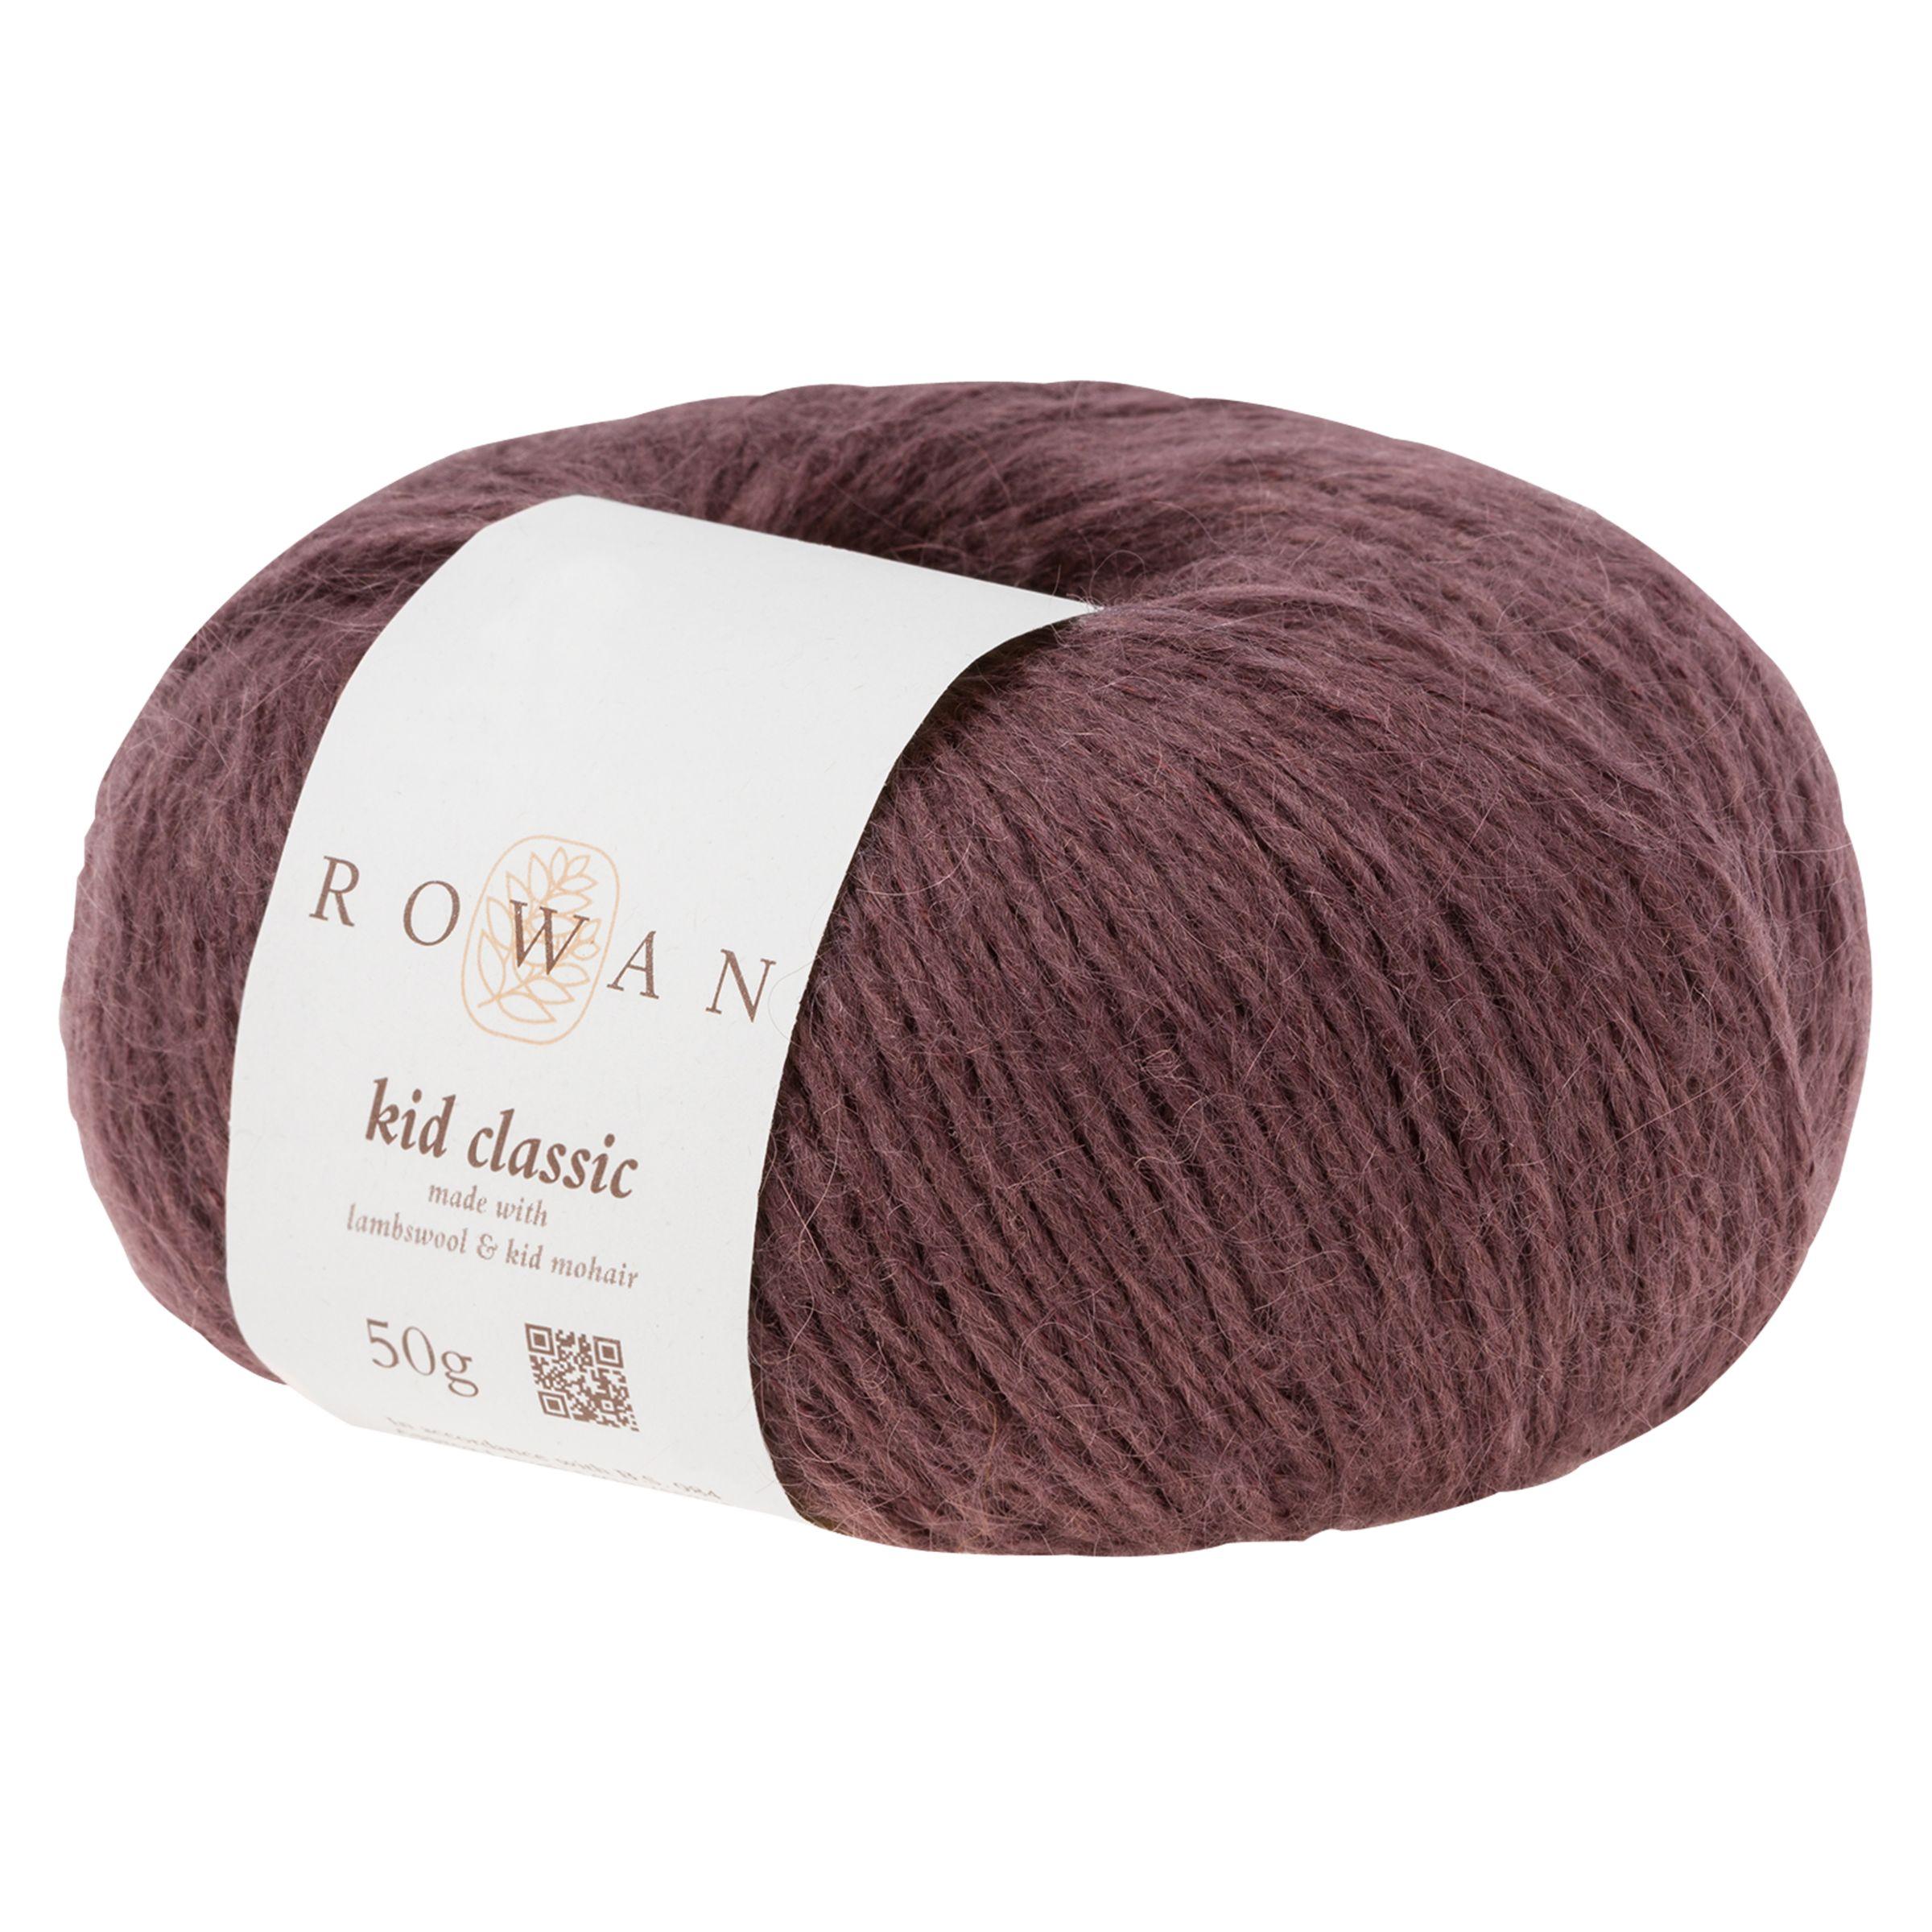 Rowan Rowan Kid Classic Yarn, 50g